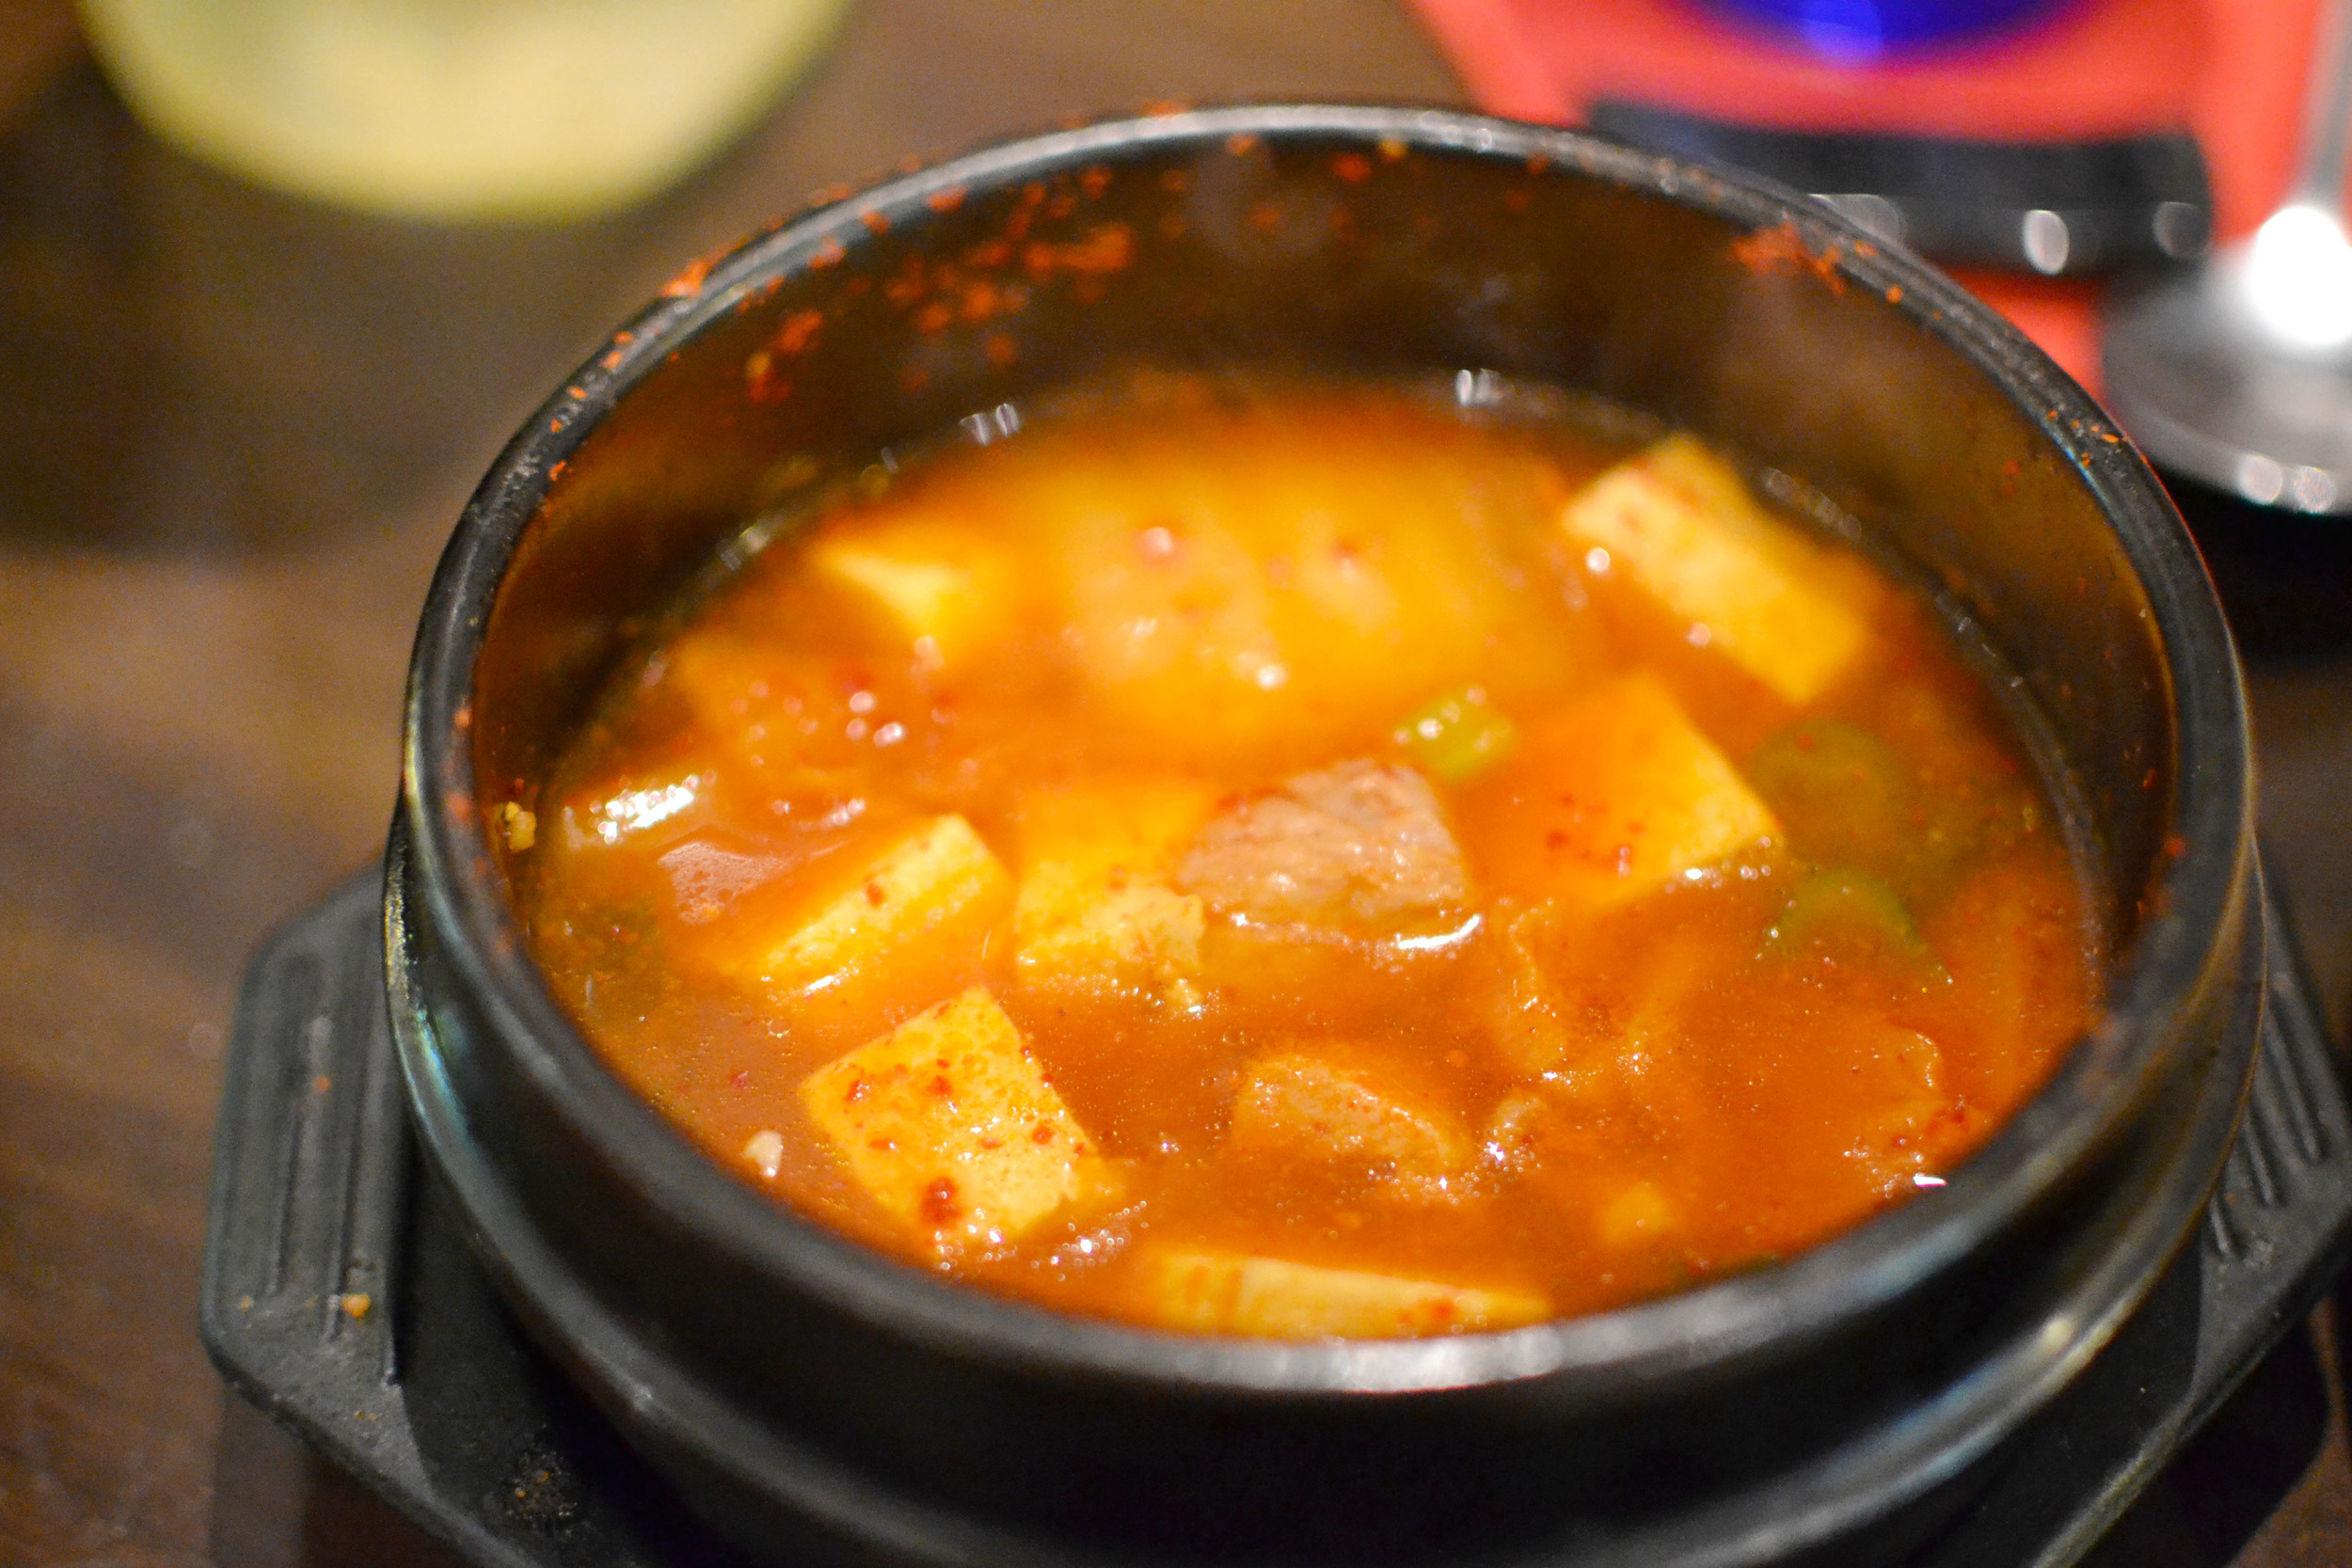 Kimchi Jjigae (Korean stew)